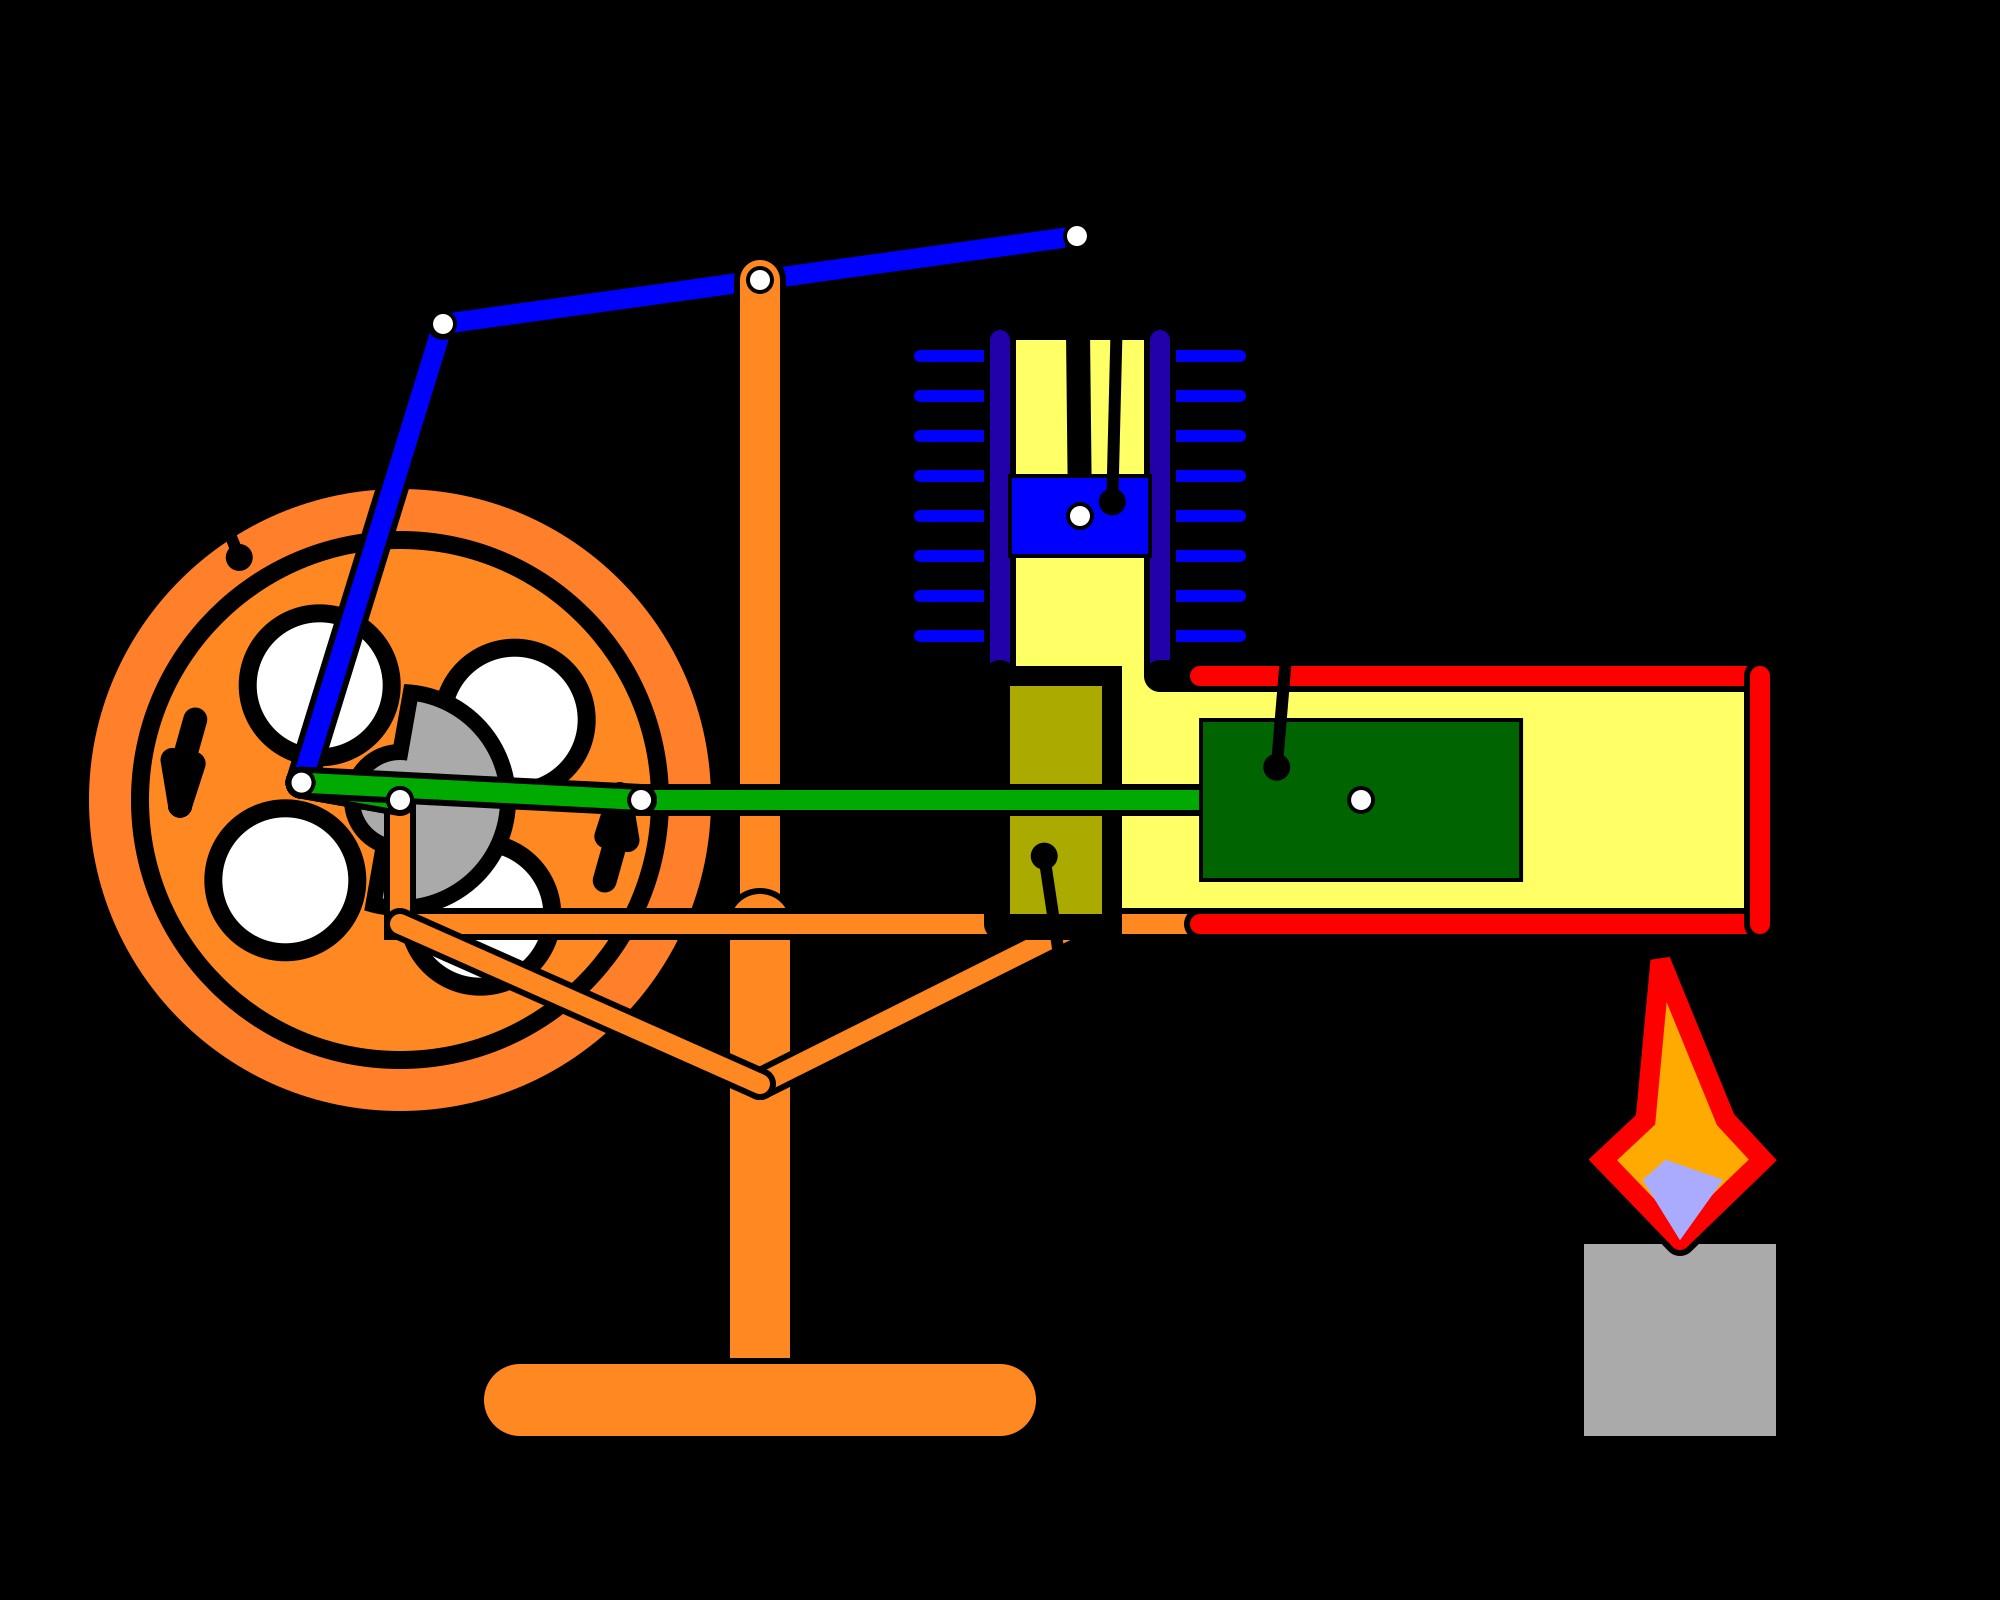 Stirling Engine Diagram File Pumpen Design Stirling Motor Mit Beschriftungg Wikimedia Of Stirling Engine Diagram